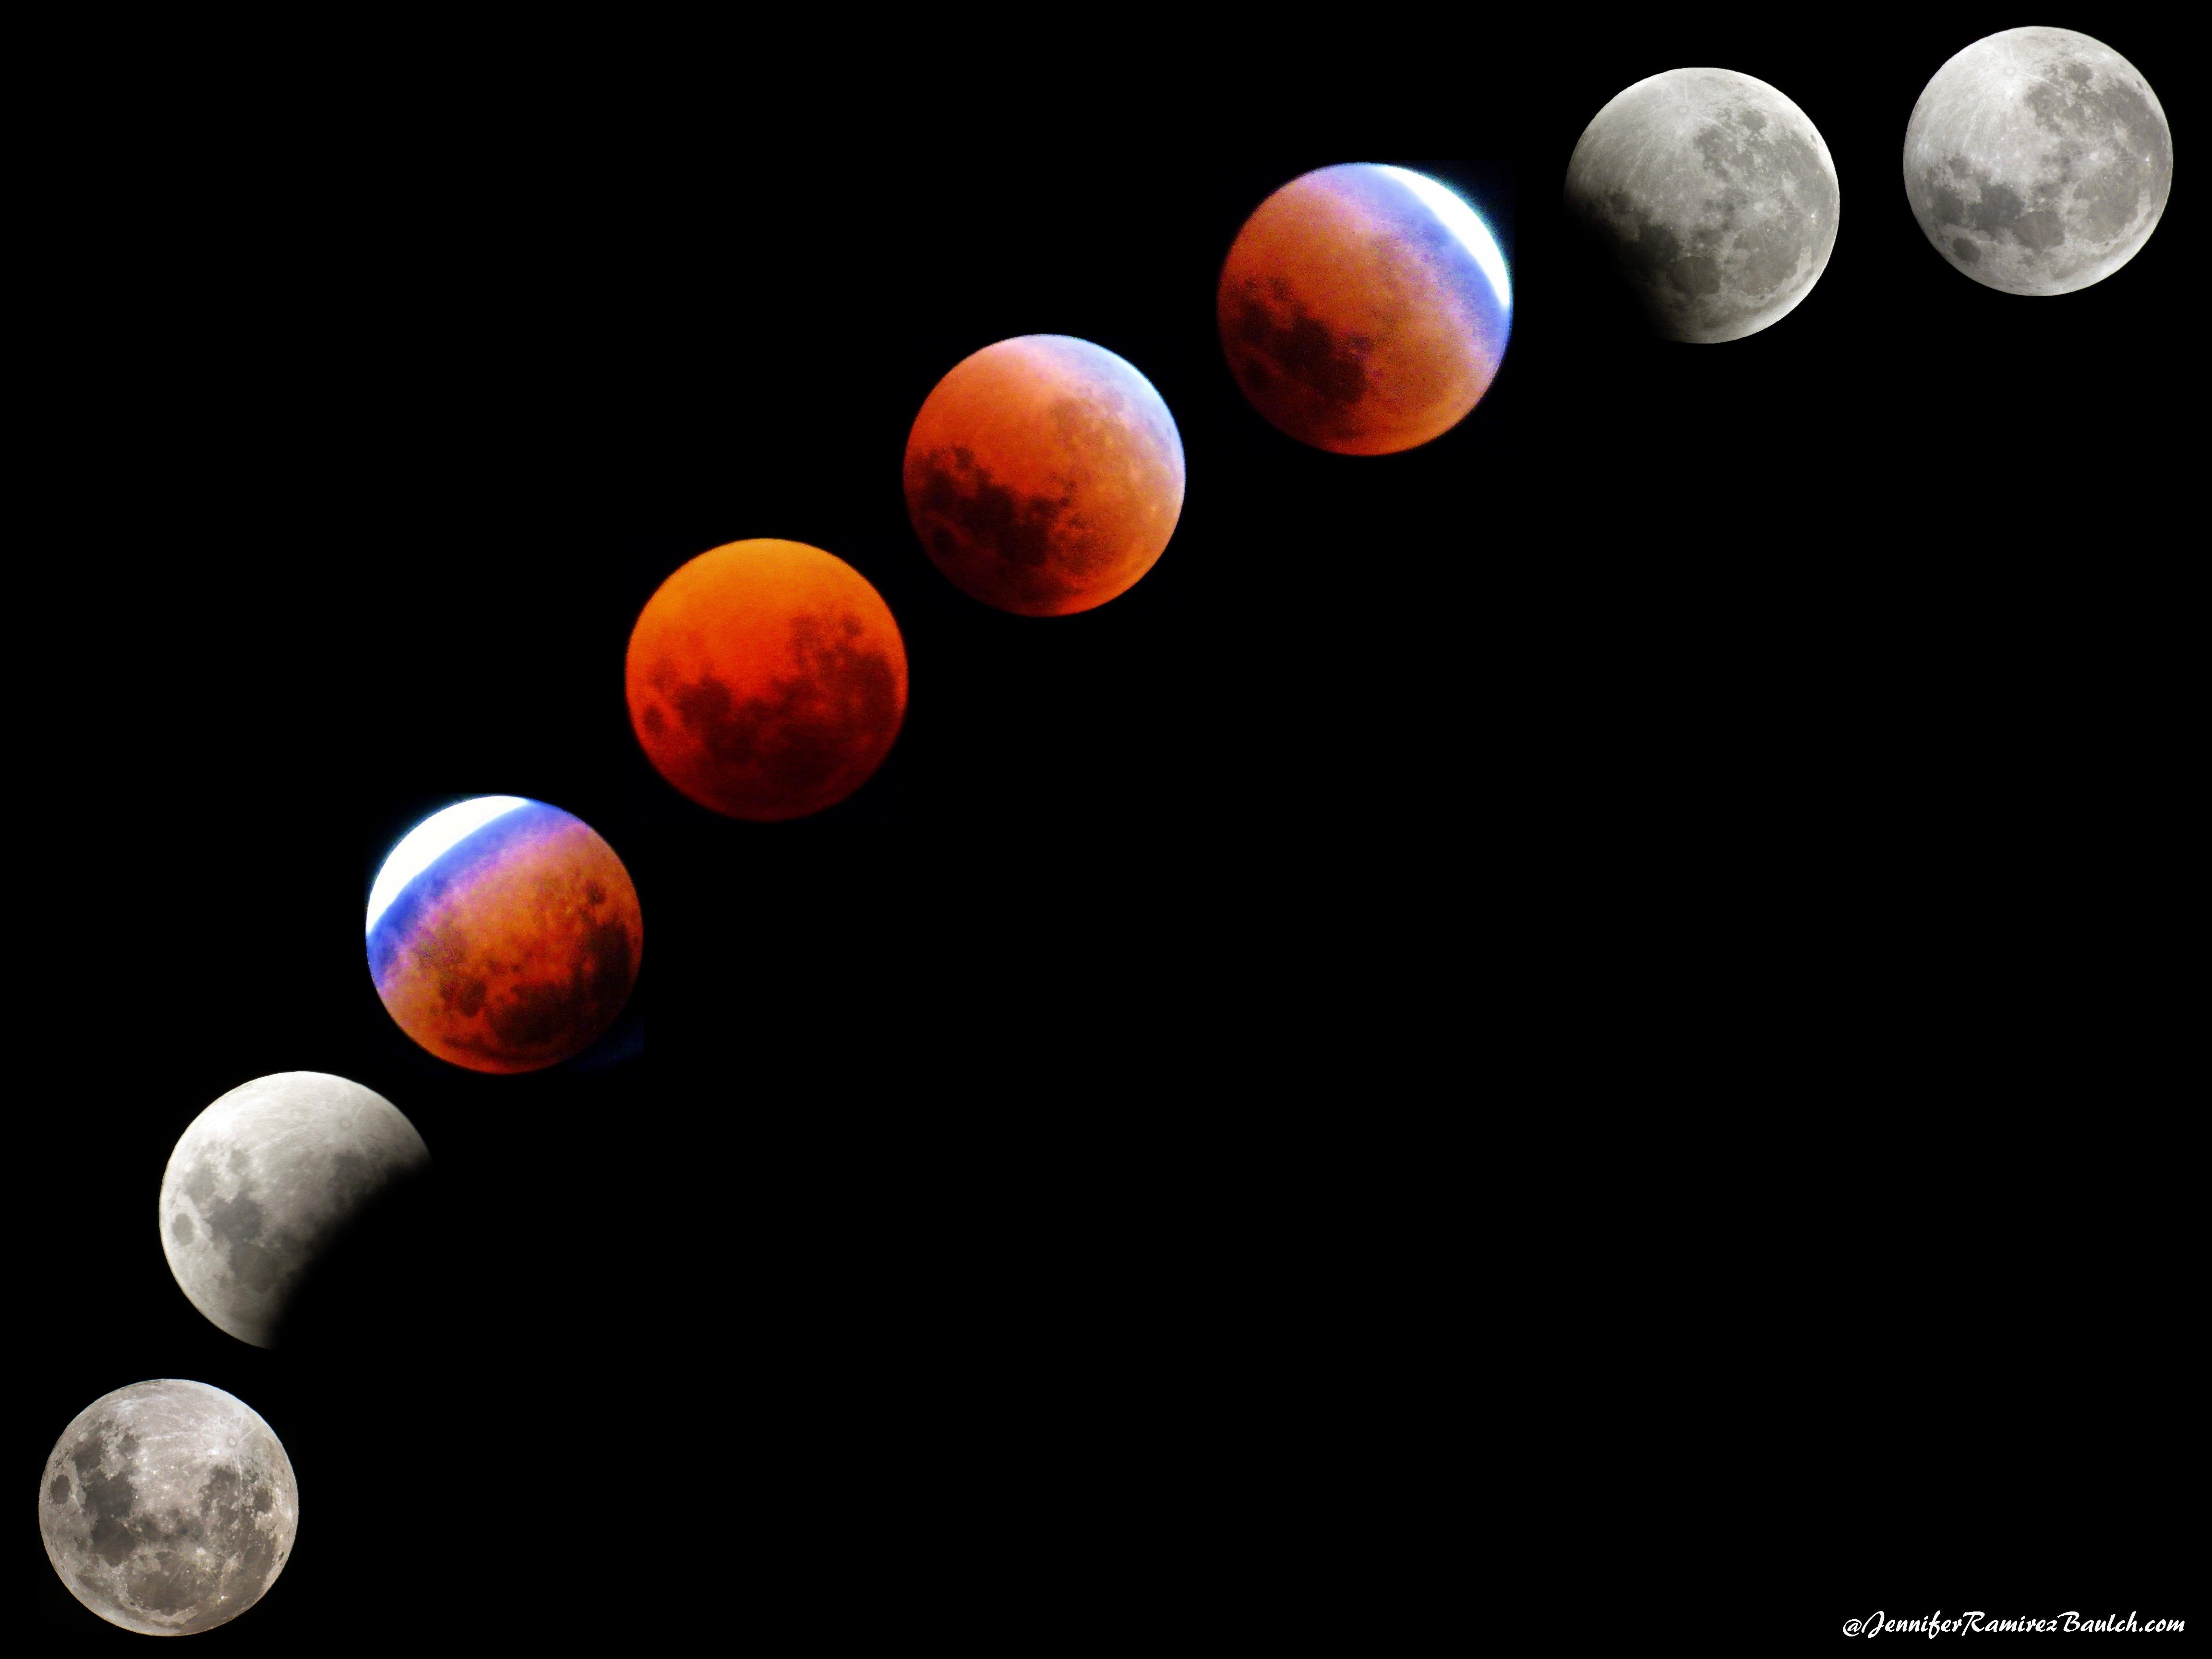 Trifecta Lunar Eclipse Super Blue Blood Moon 2018